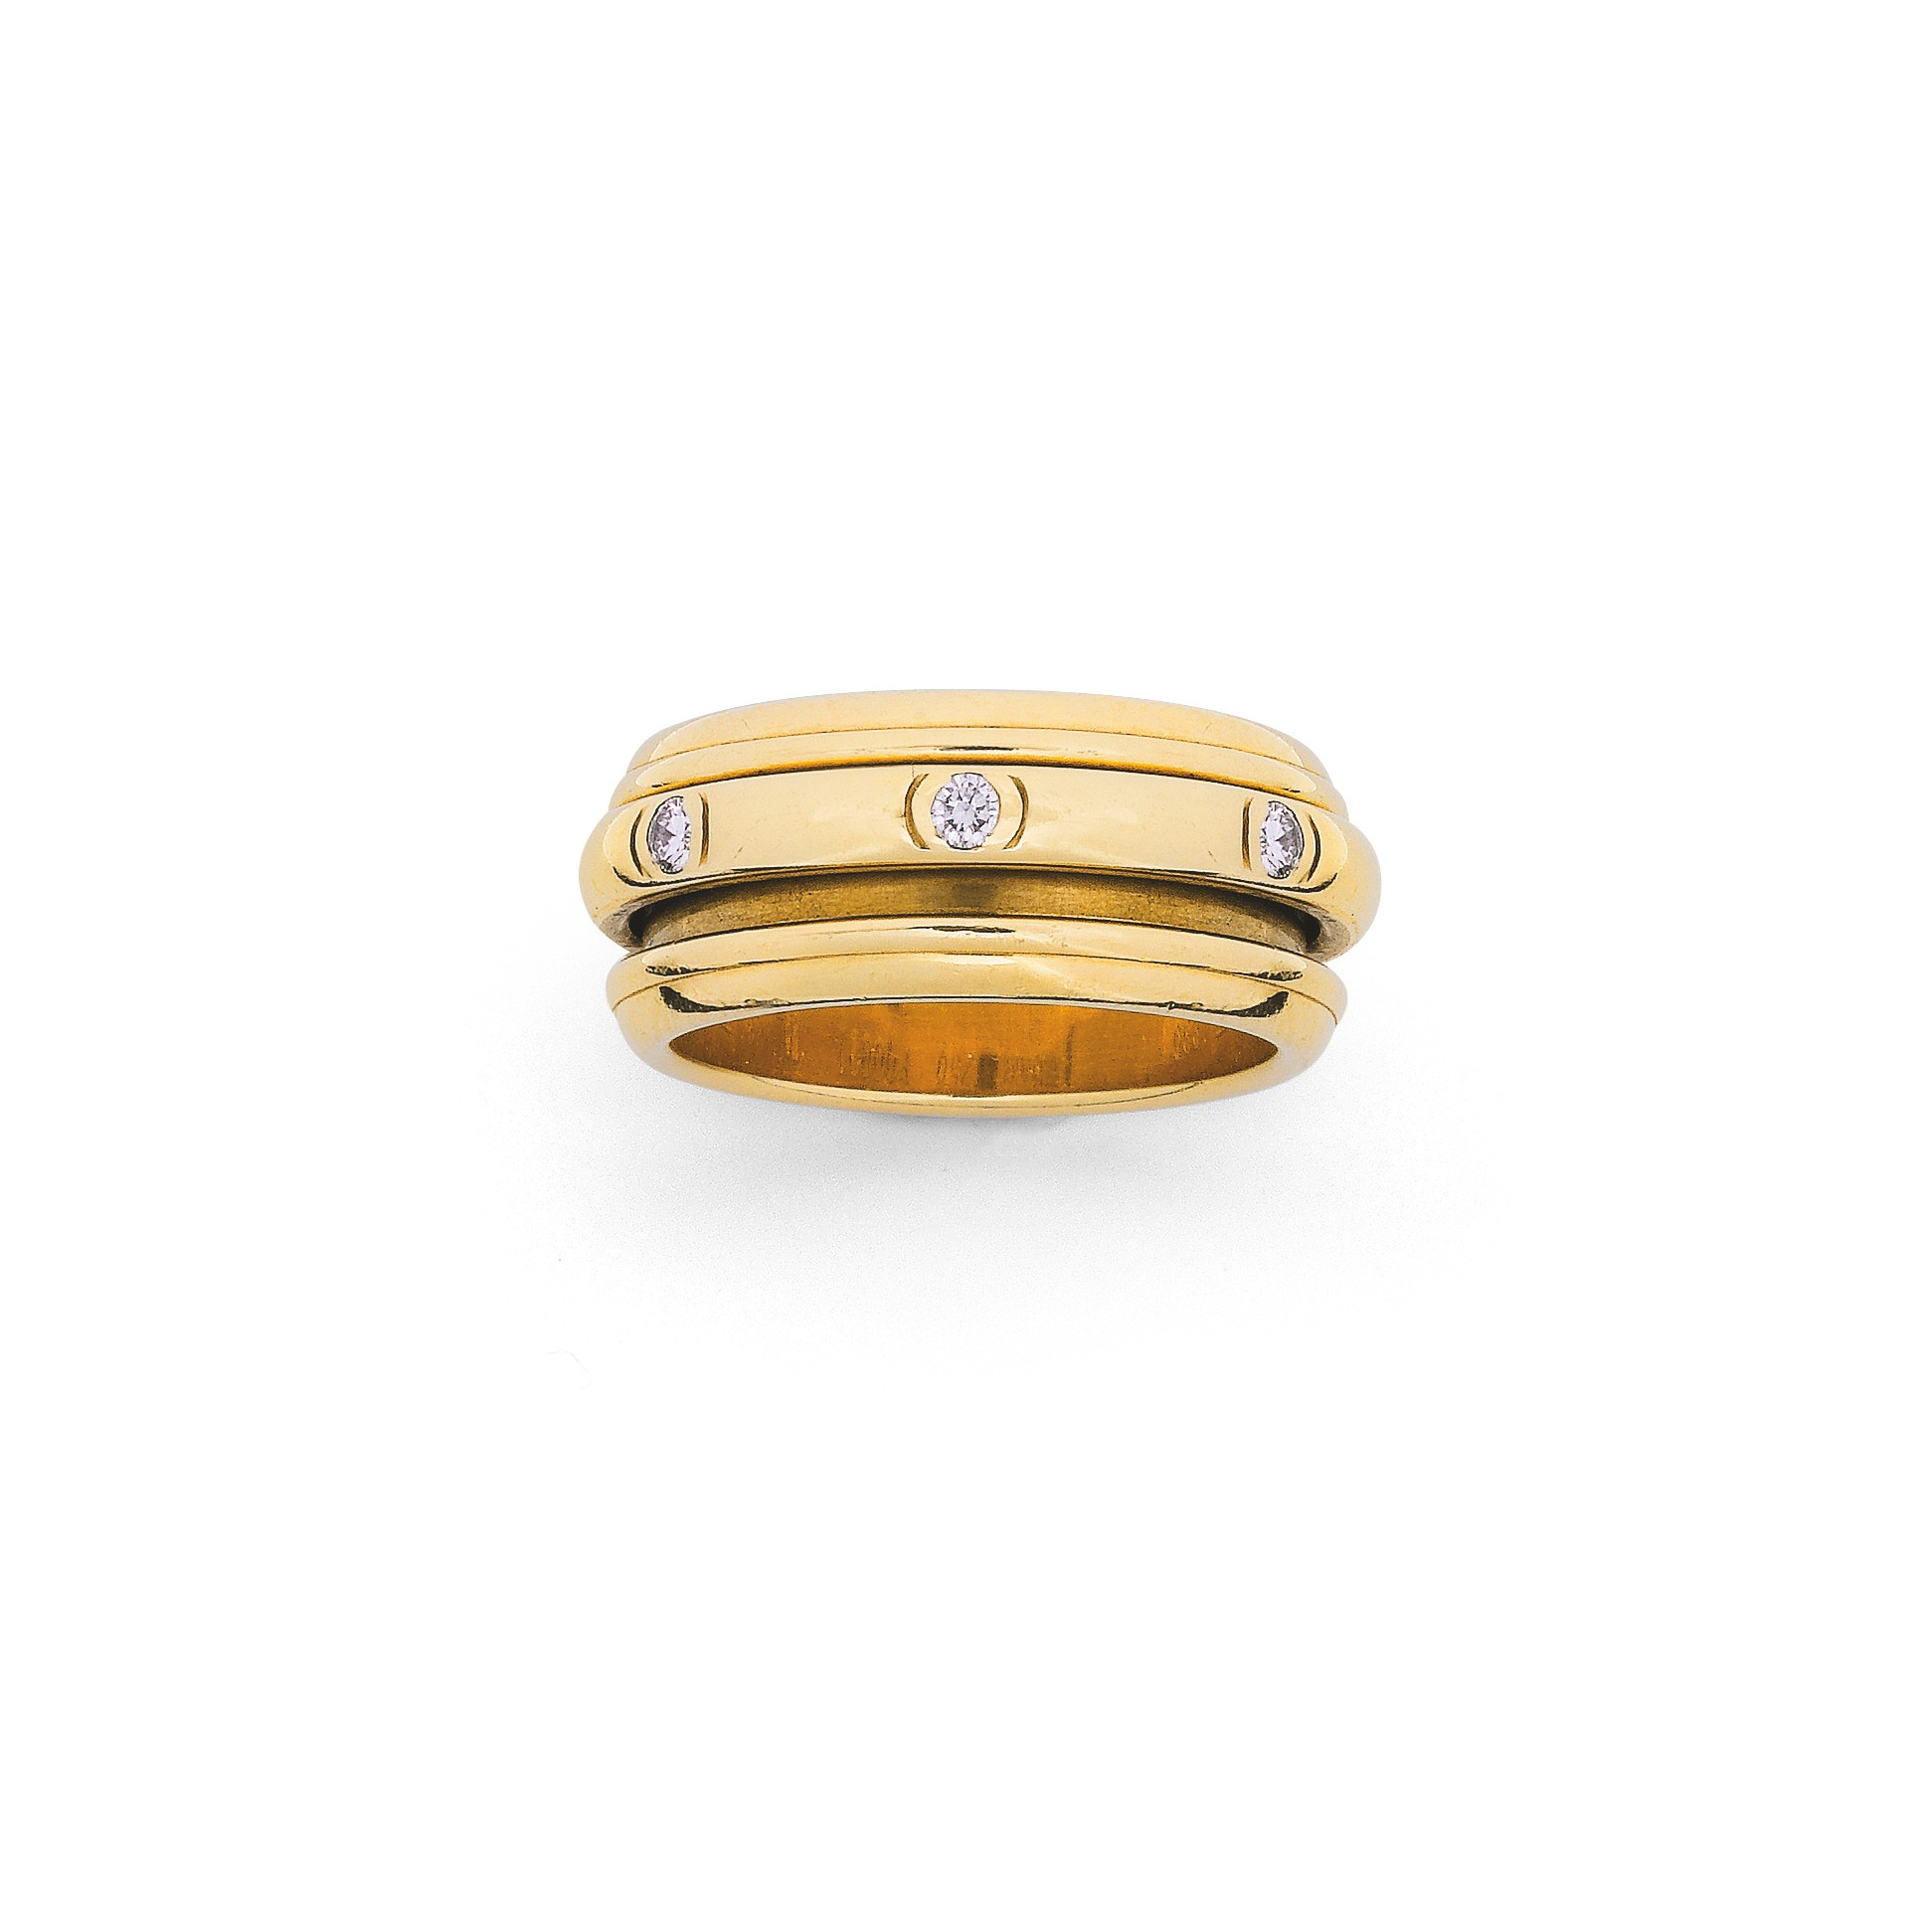 Piaget, Diamond ring [Bague diamants], 'Possession'